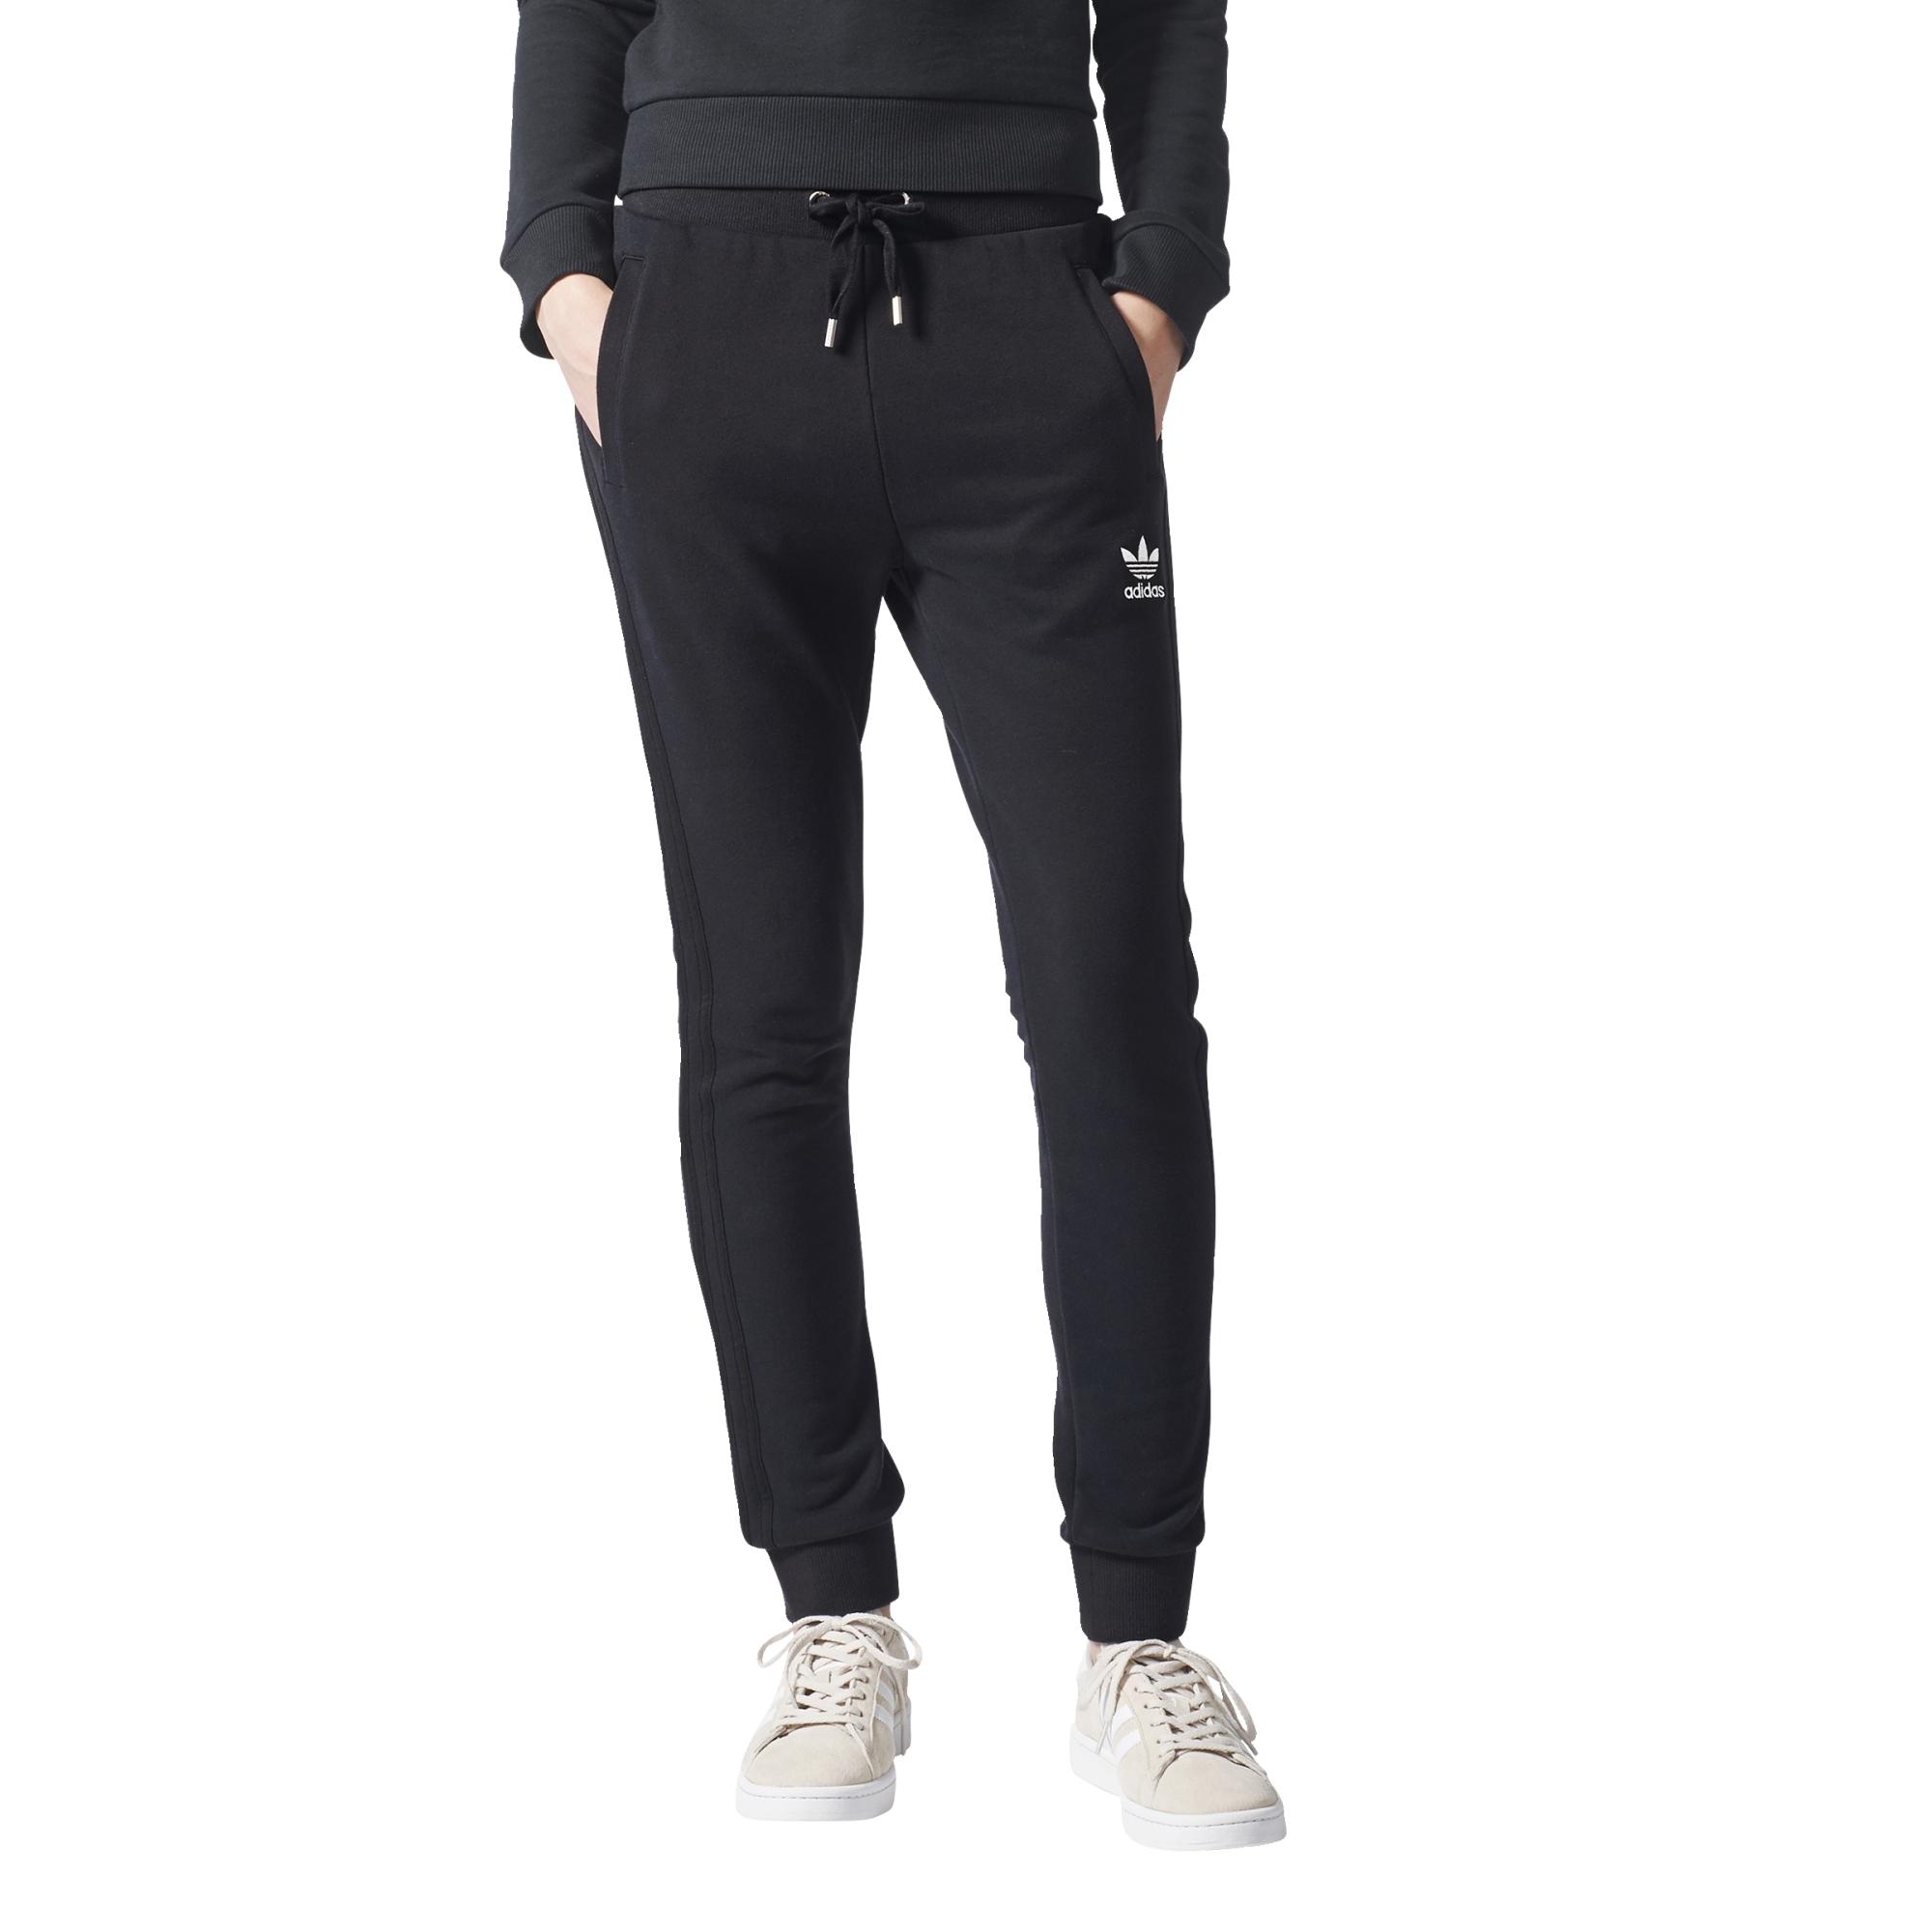 fda31a177e8 Adidas Originals Cuffed Slim black Track Pants n4ZUn --mamba ...